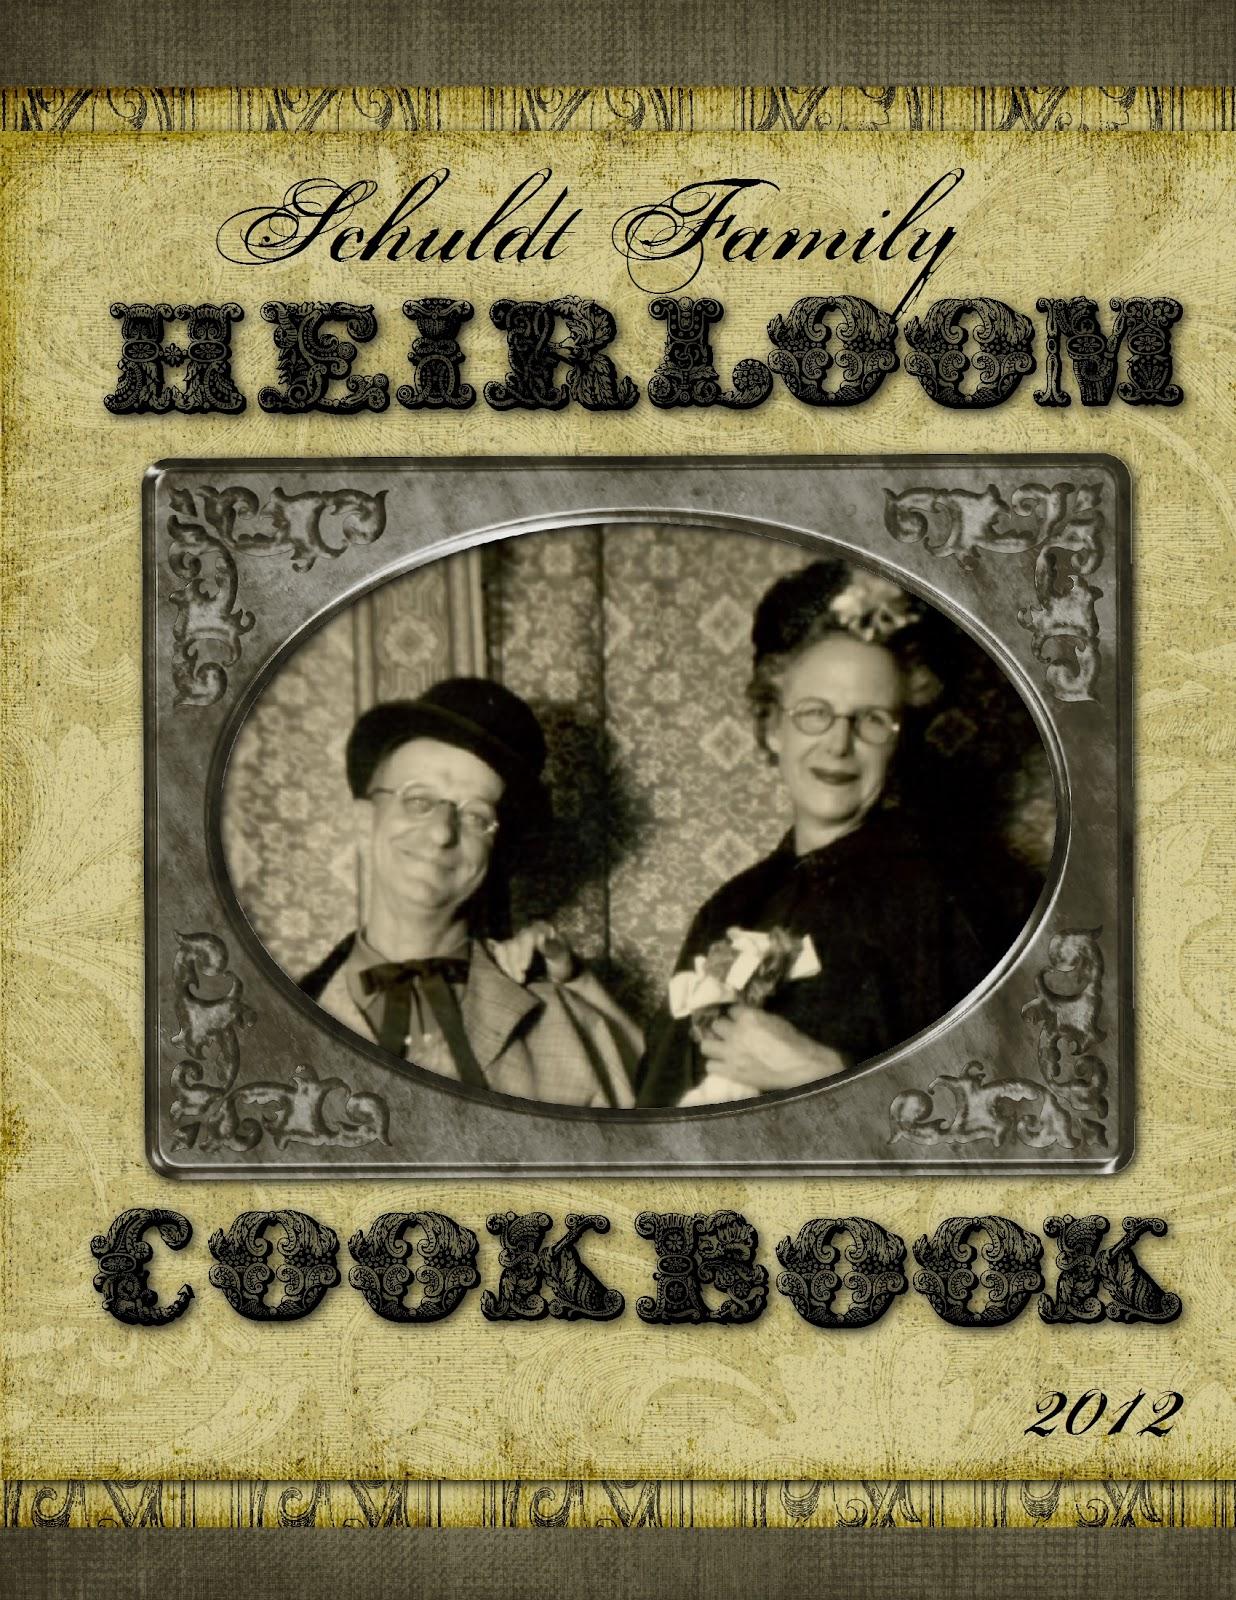 kids cookbook template - heritage collector storybook family heirloom cookbook